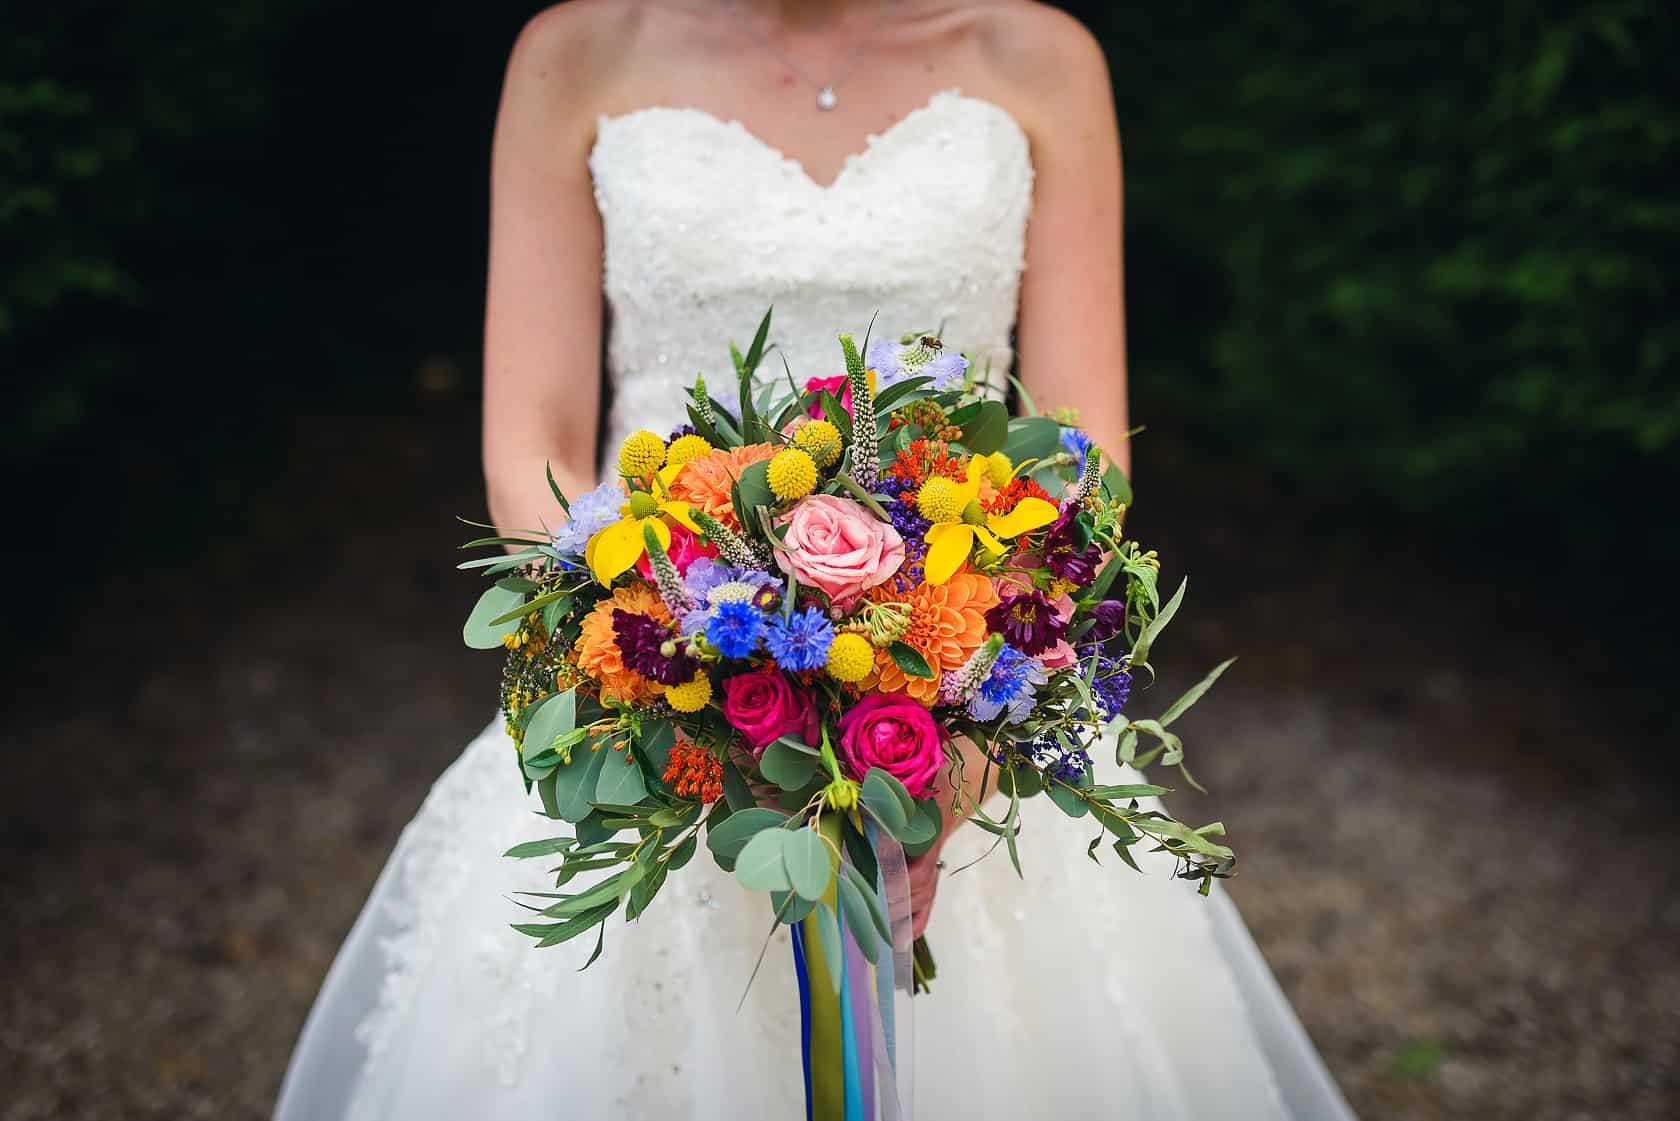 Best_Wedding_Photography_2018_Wedding-Photographer-Essex-and-London_048